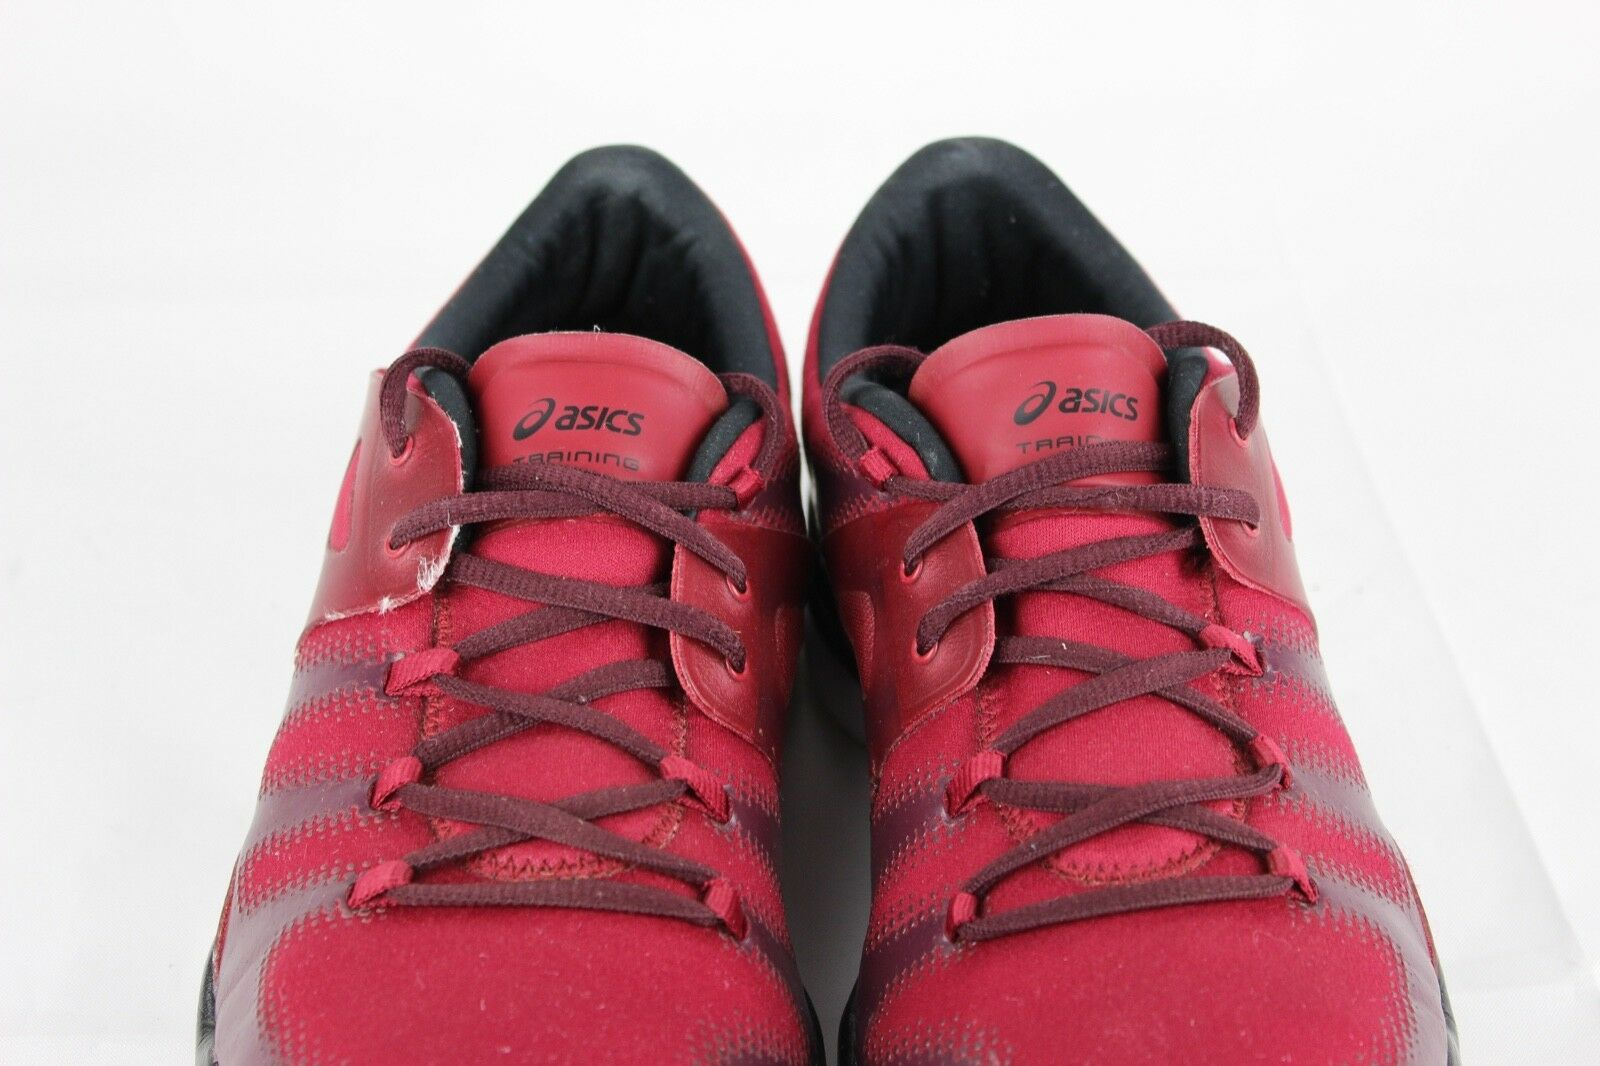 Asics Gel Passform Vida Damen Schuhe Rot Laufen Training Sneakers Schnürsenkel image 4